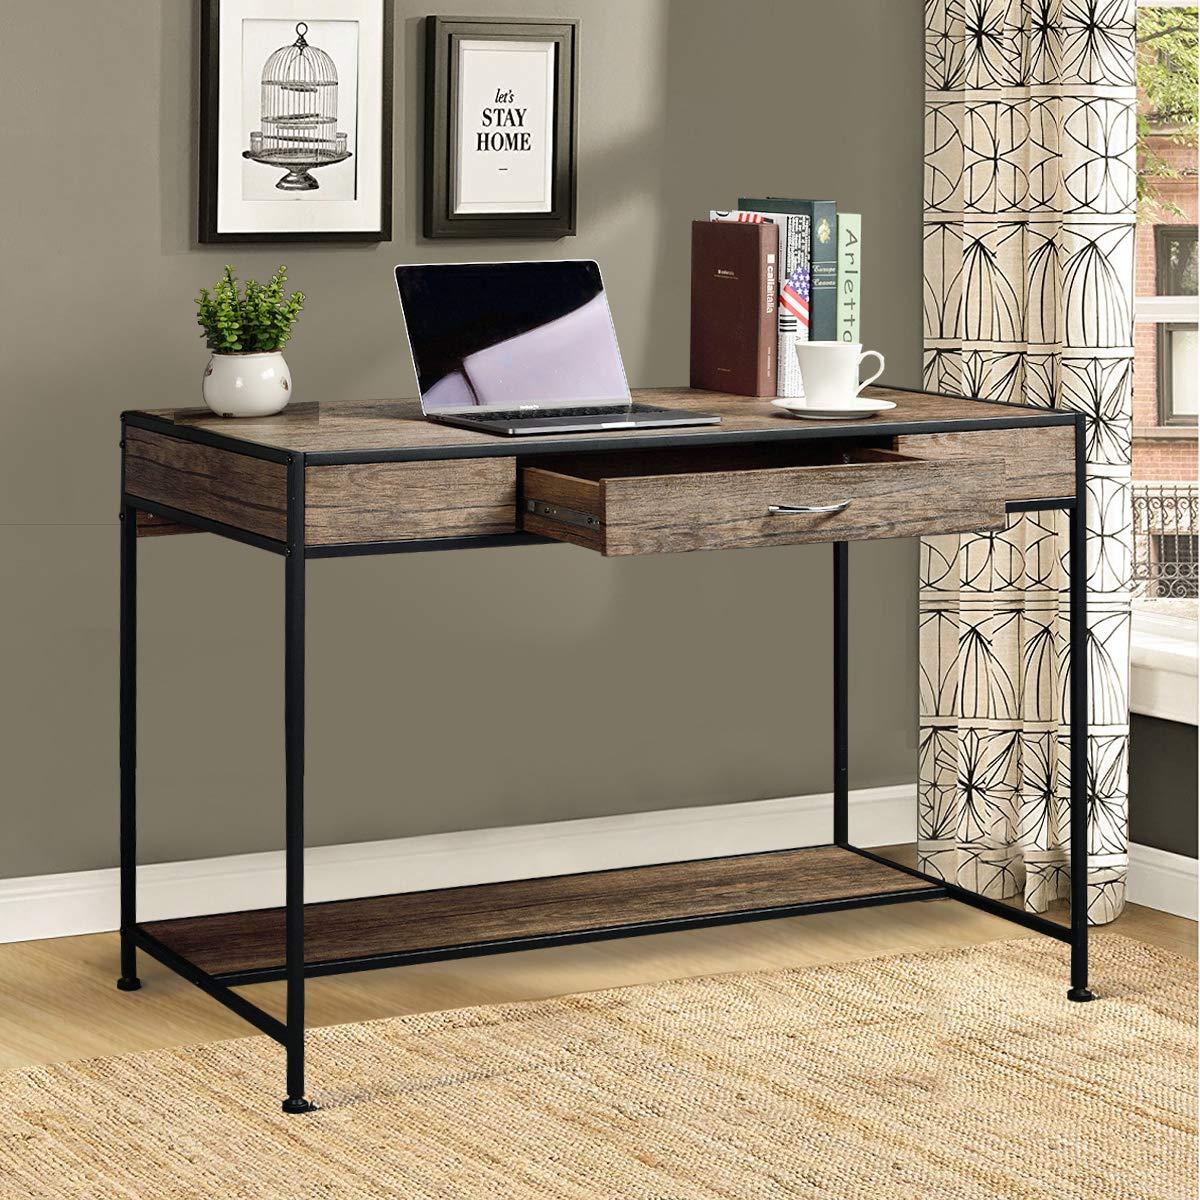 Aingoo Large Writing Desk with Drawer 43x22 Rustic Computer Desk Slim Metal MDF Wood Grain Workstation for Brown Farmhouse